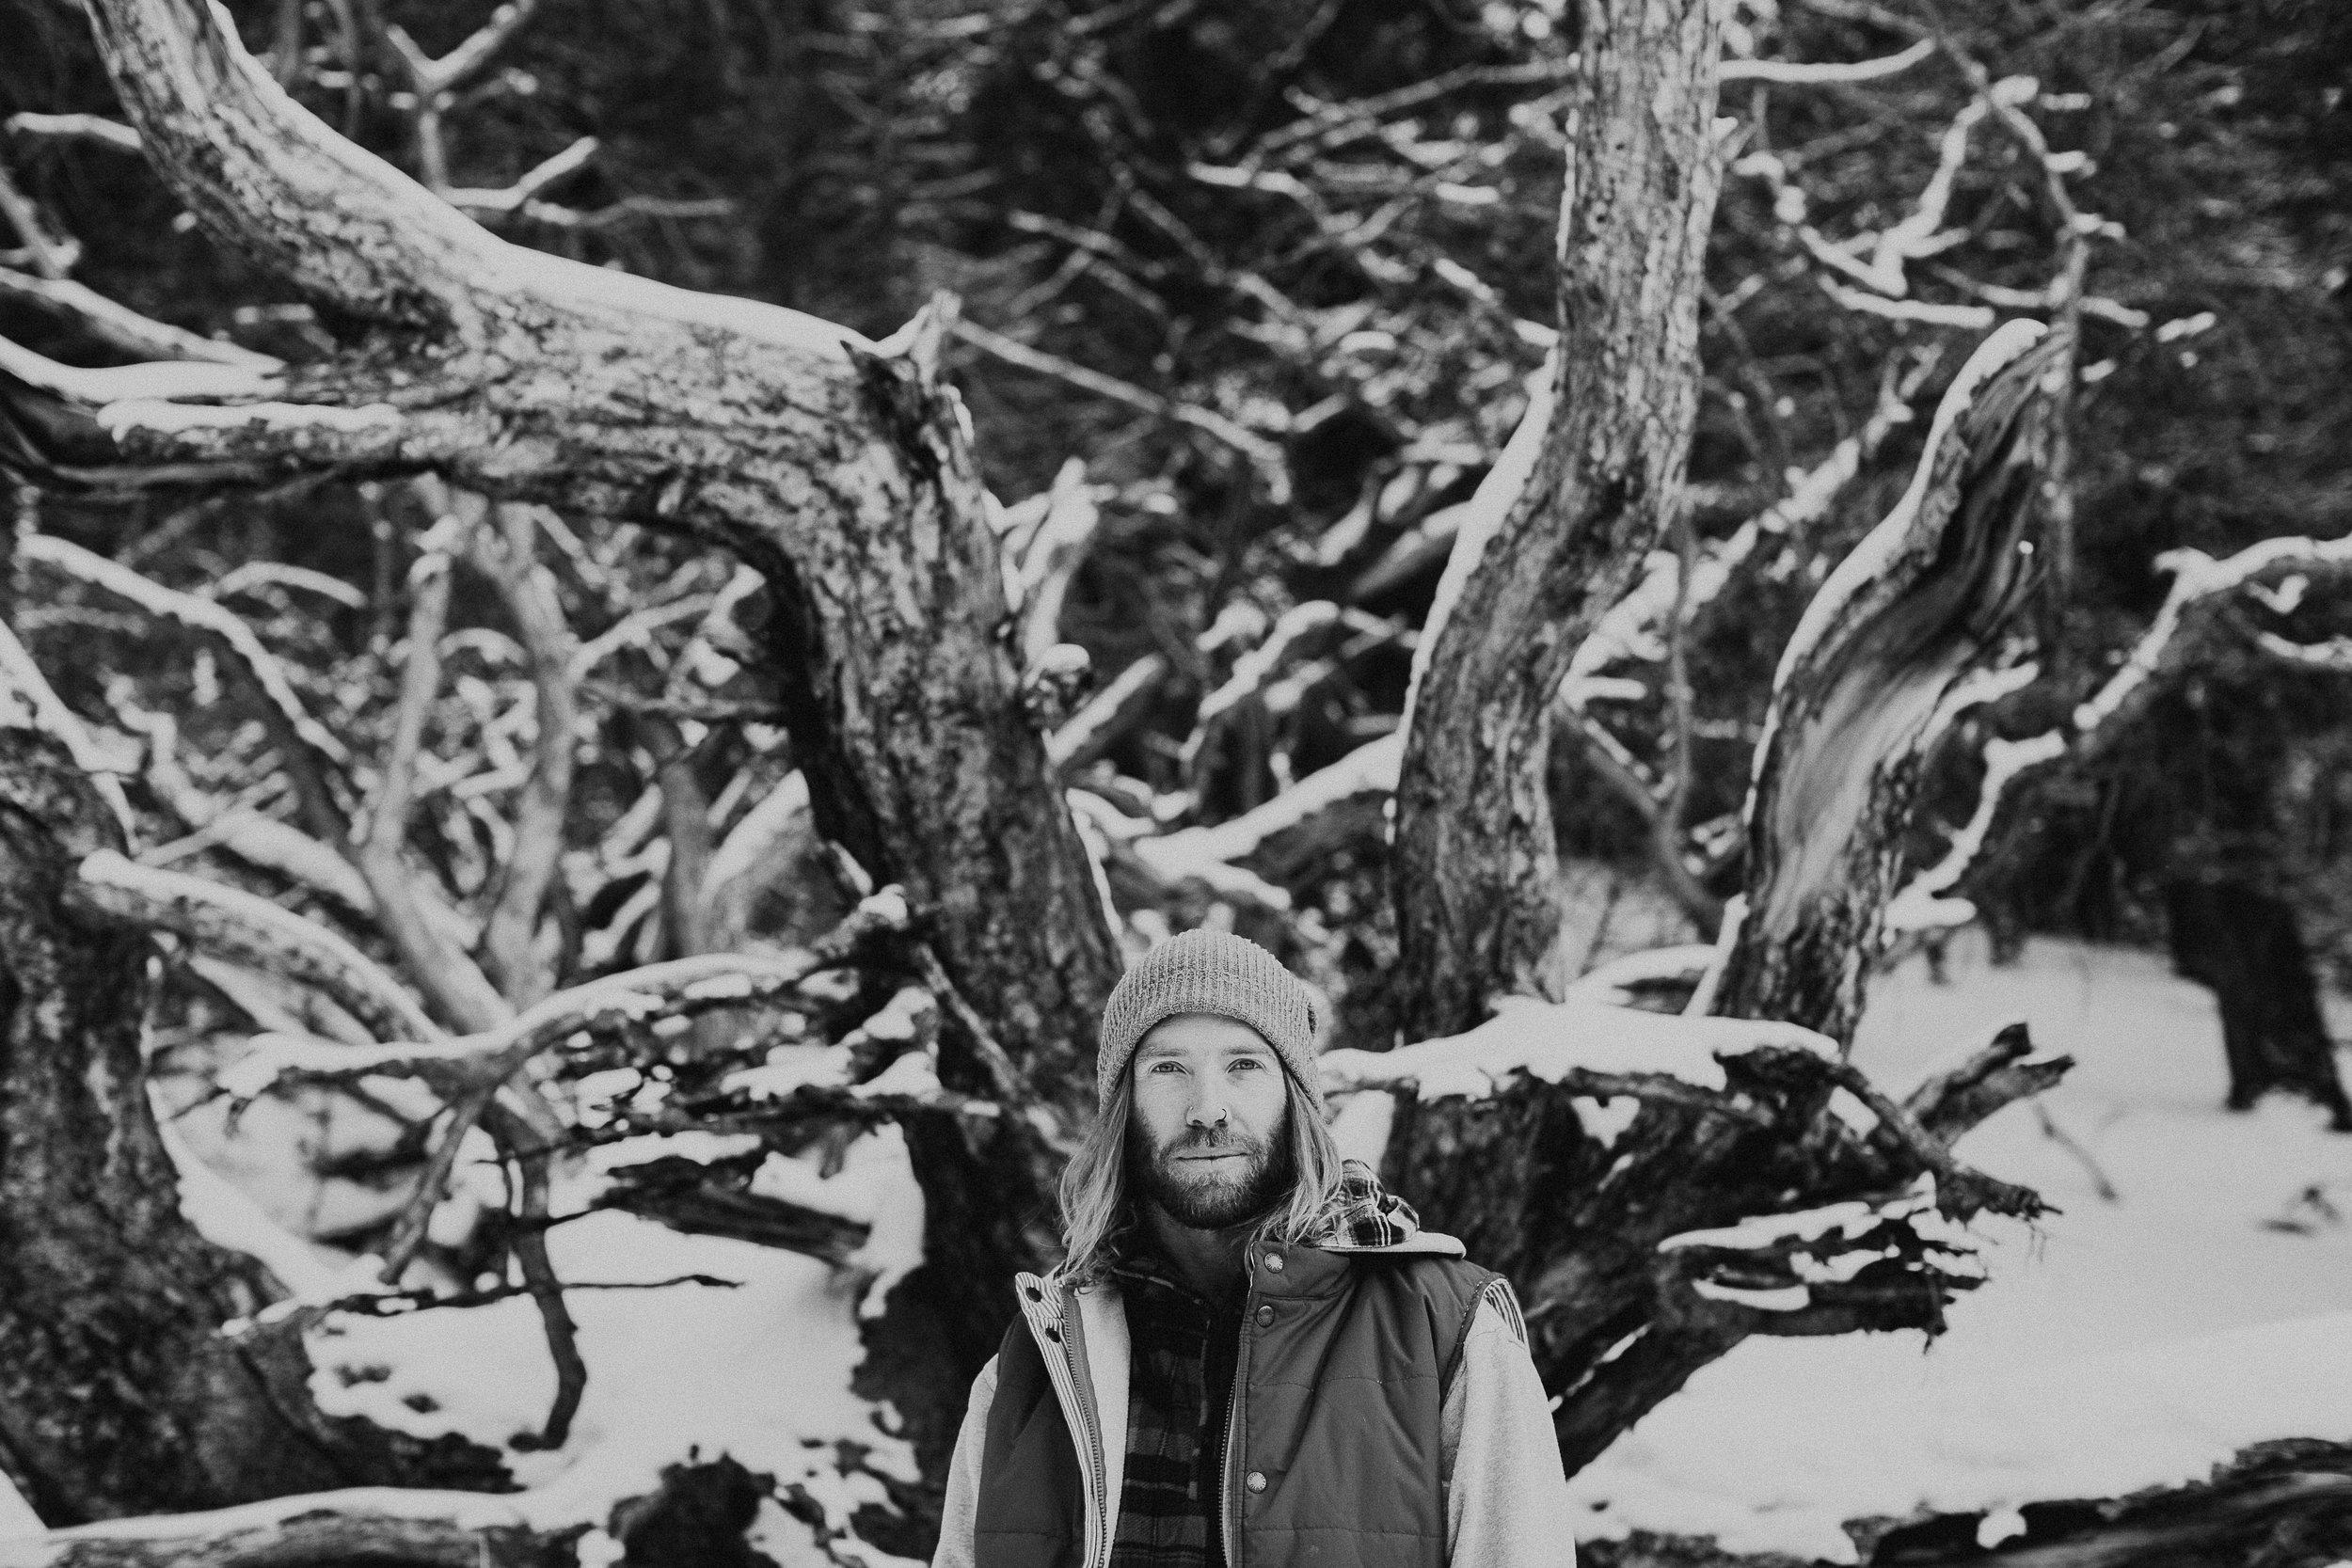 Banff Engagement Photographer - Winter Mountain Adventure Engagement Session - Michelle Larmand Photography-070